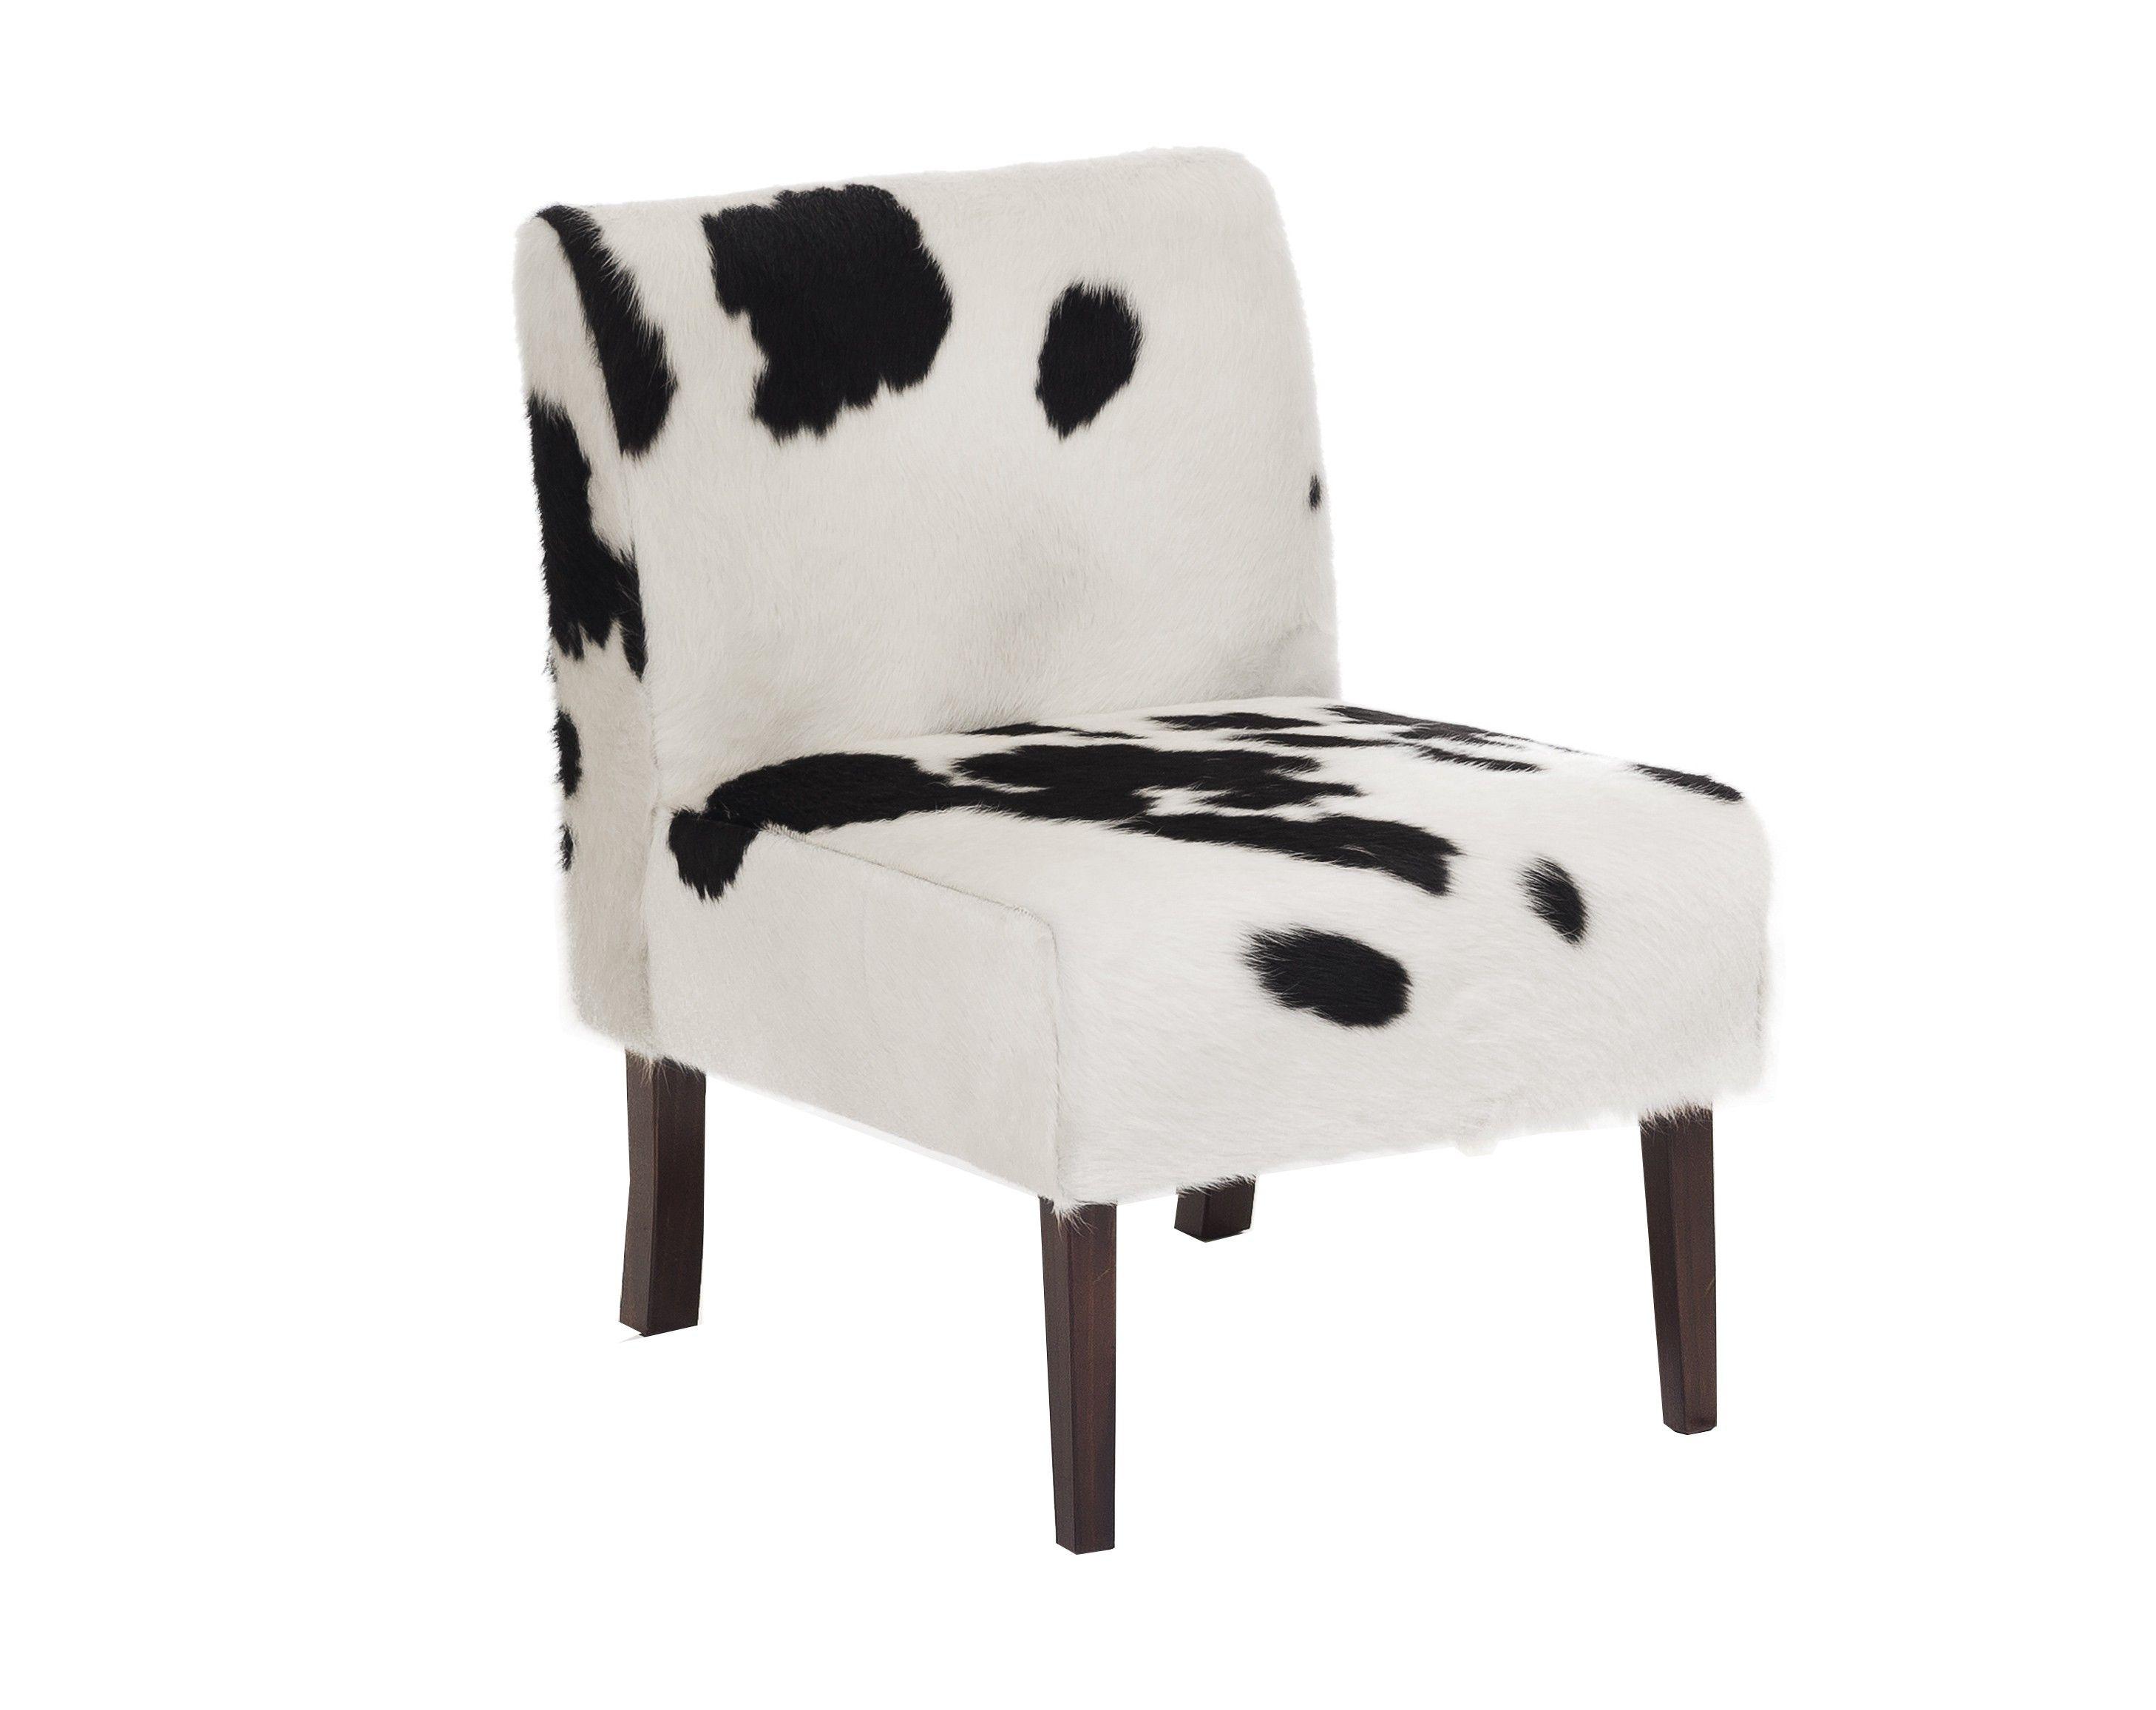 cowhide chairs Moo Moo Cowhide Chair